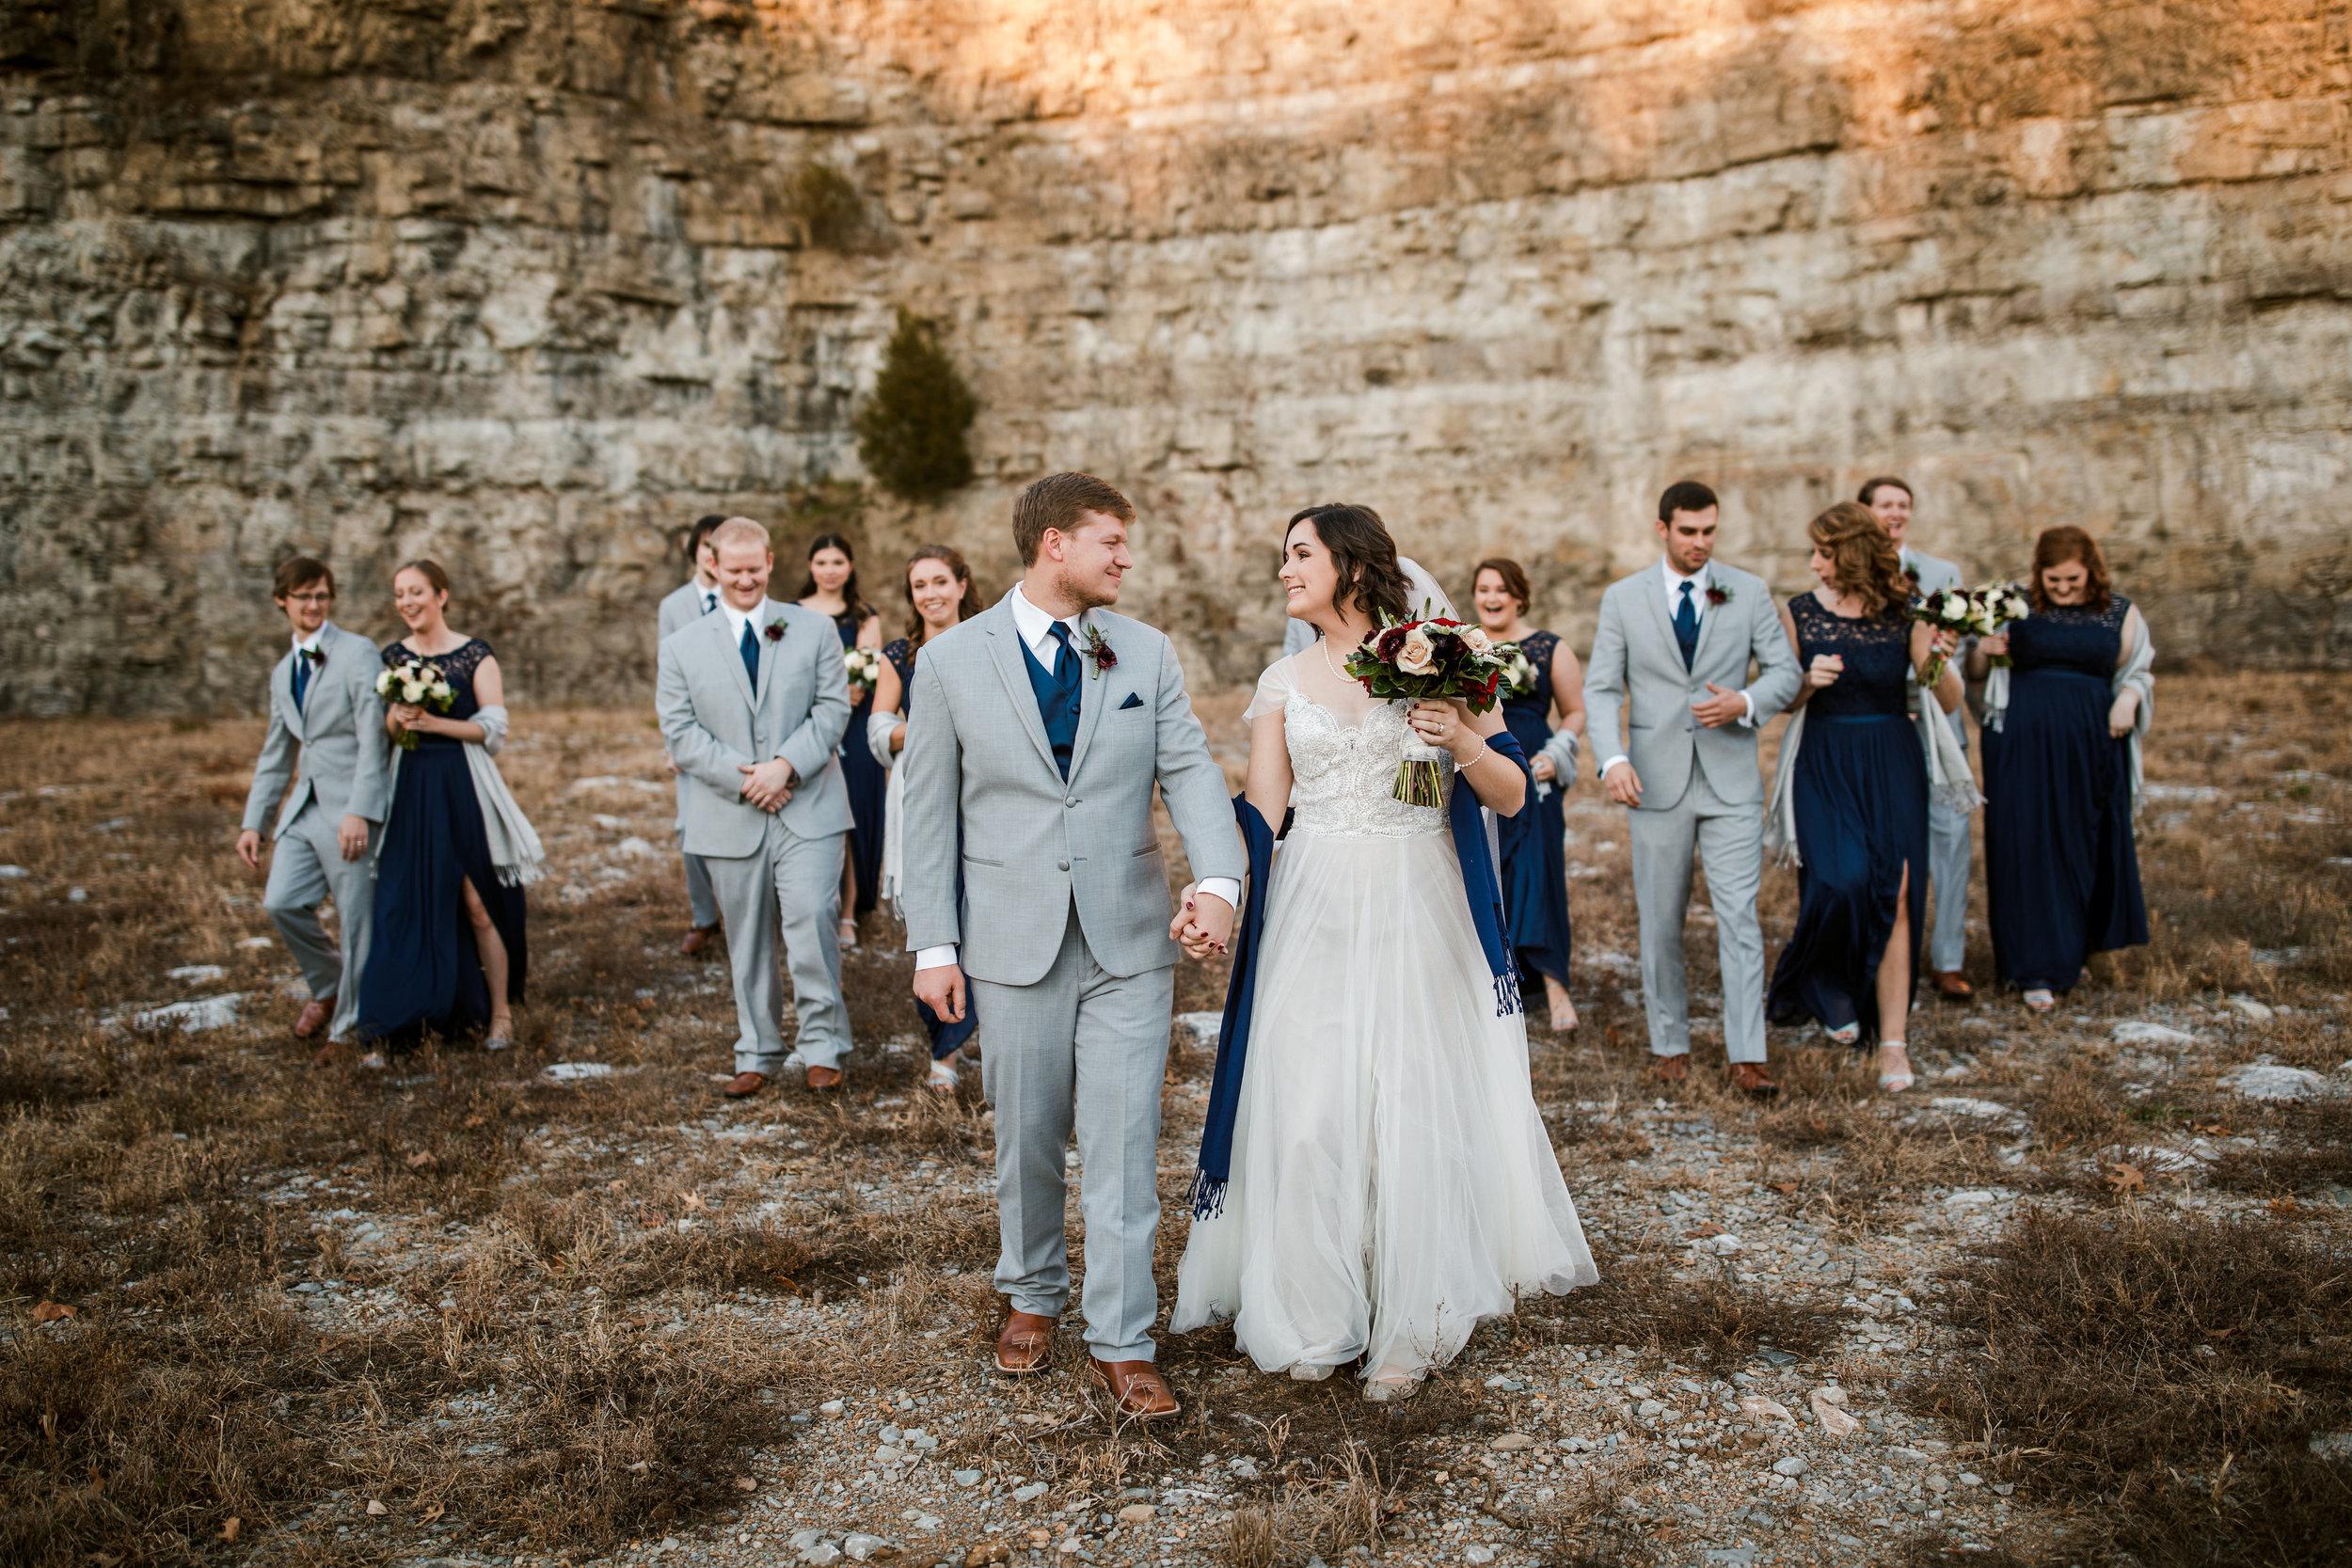 Graystone-Quarry-Wedding 56.jpg